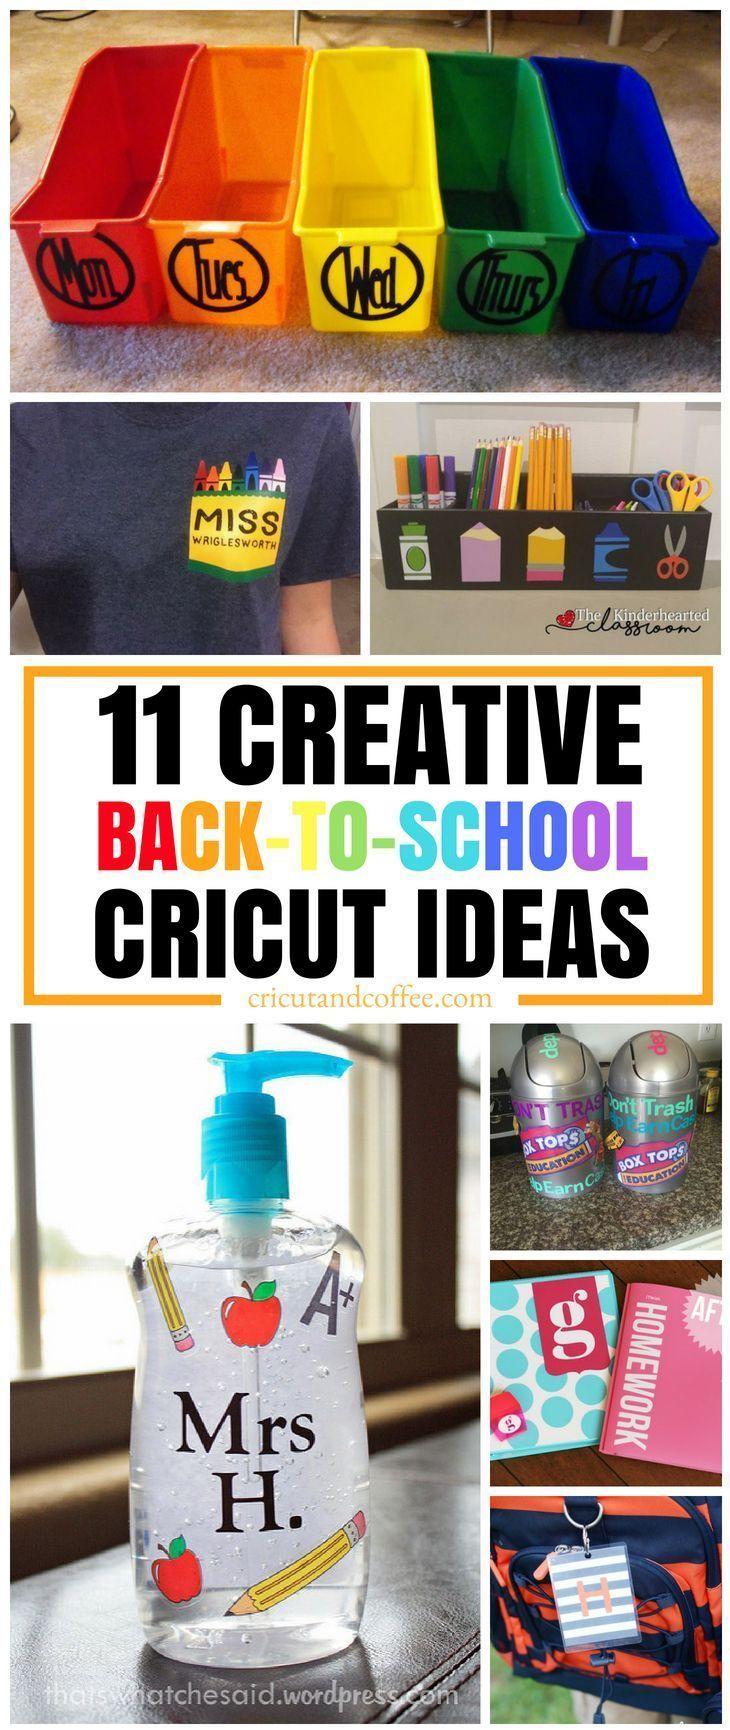 You Ll Love All Of These Cricut Ideas For The School Year Cricut